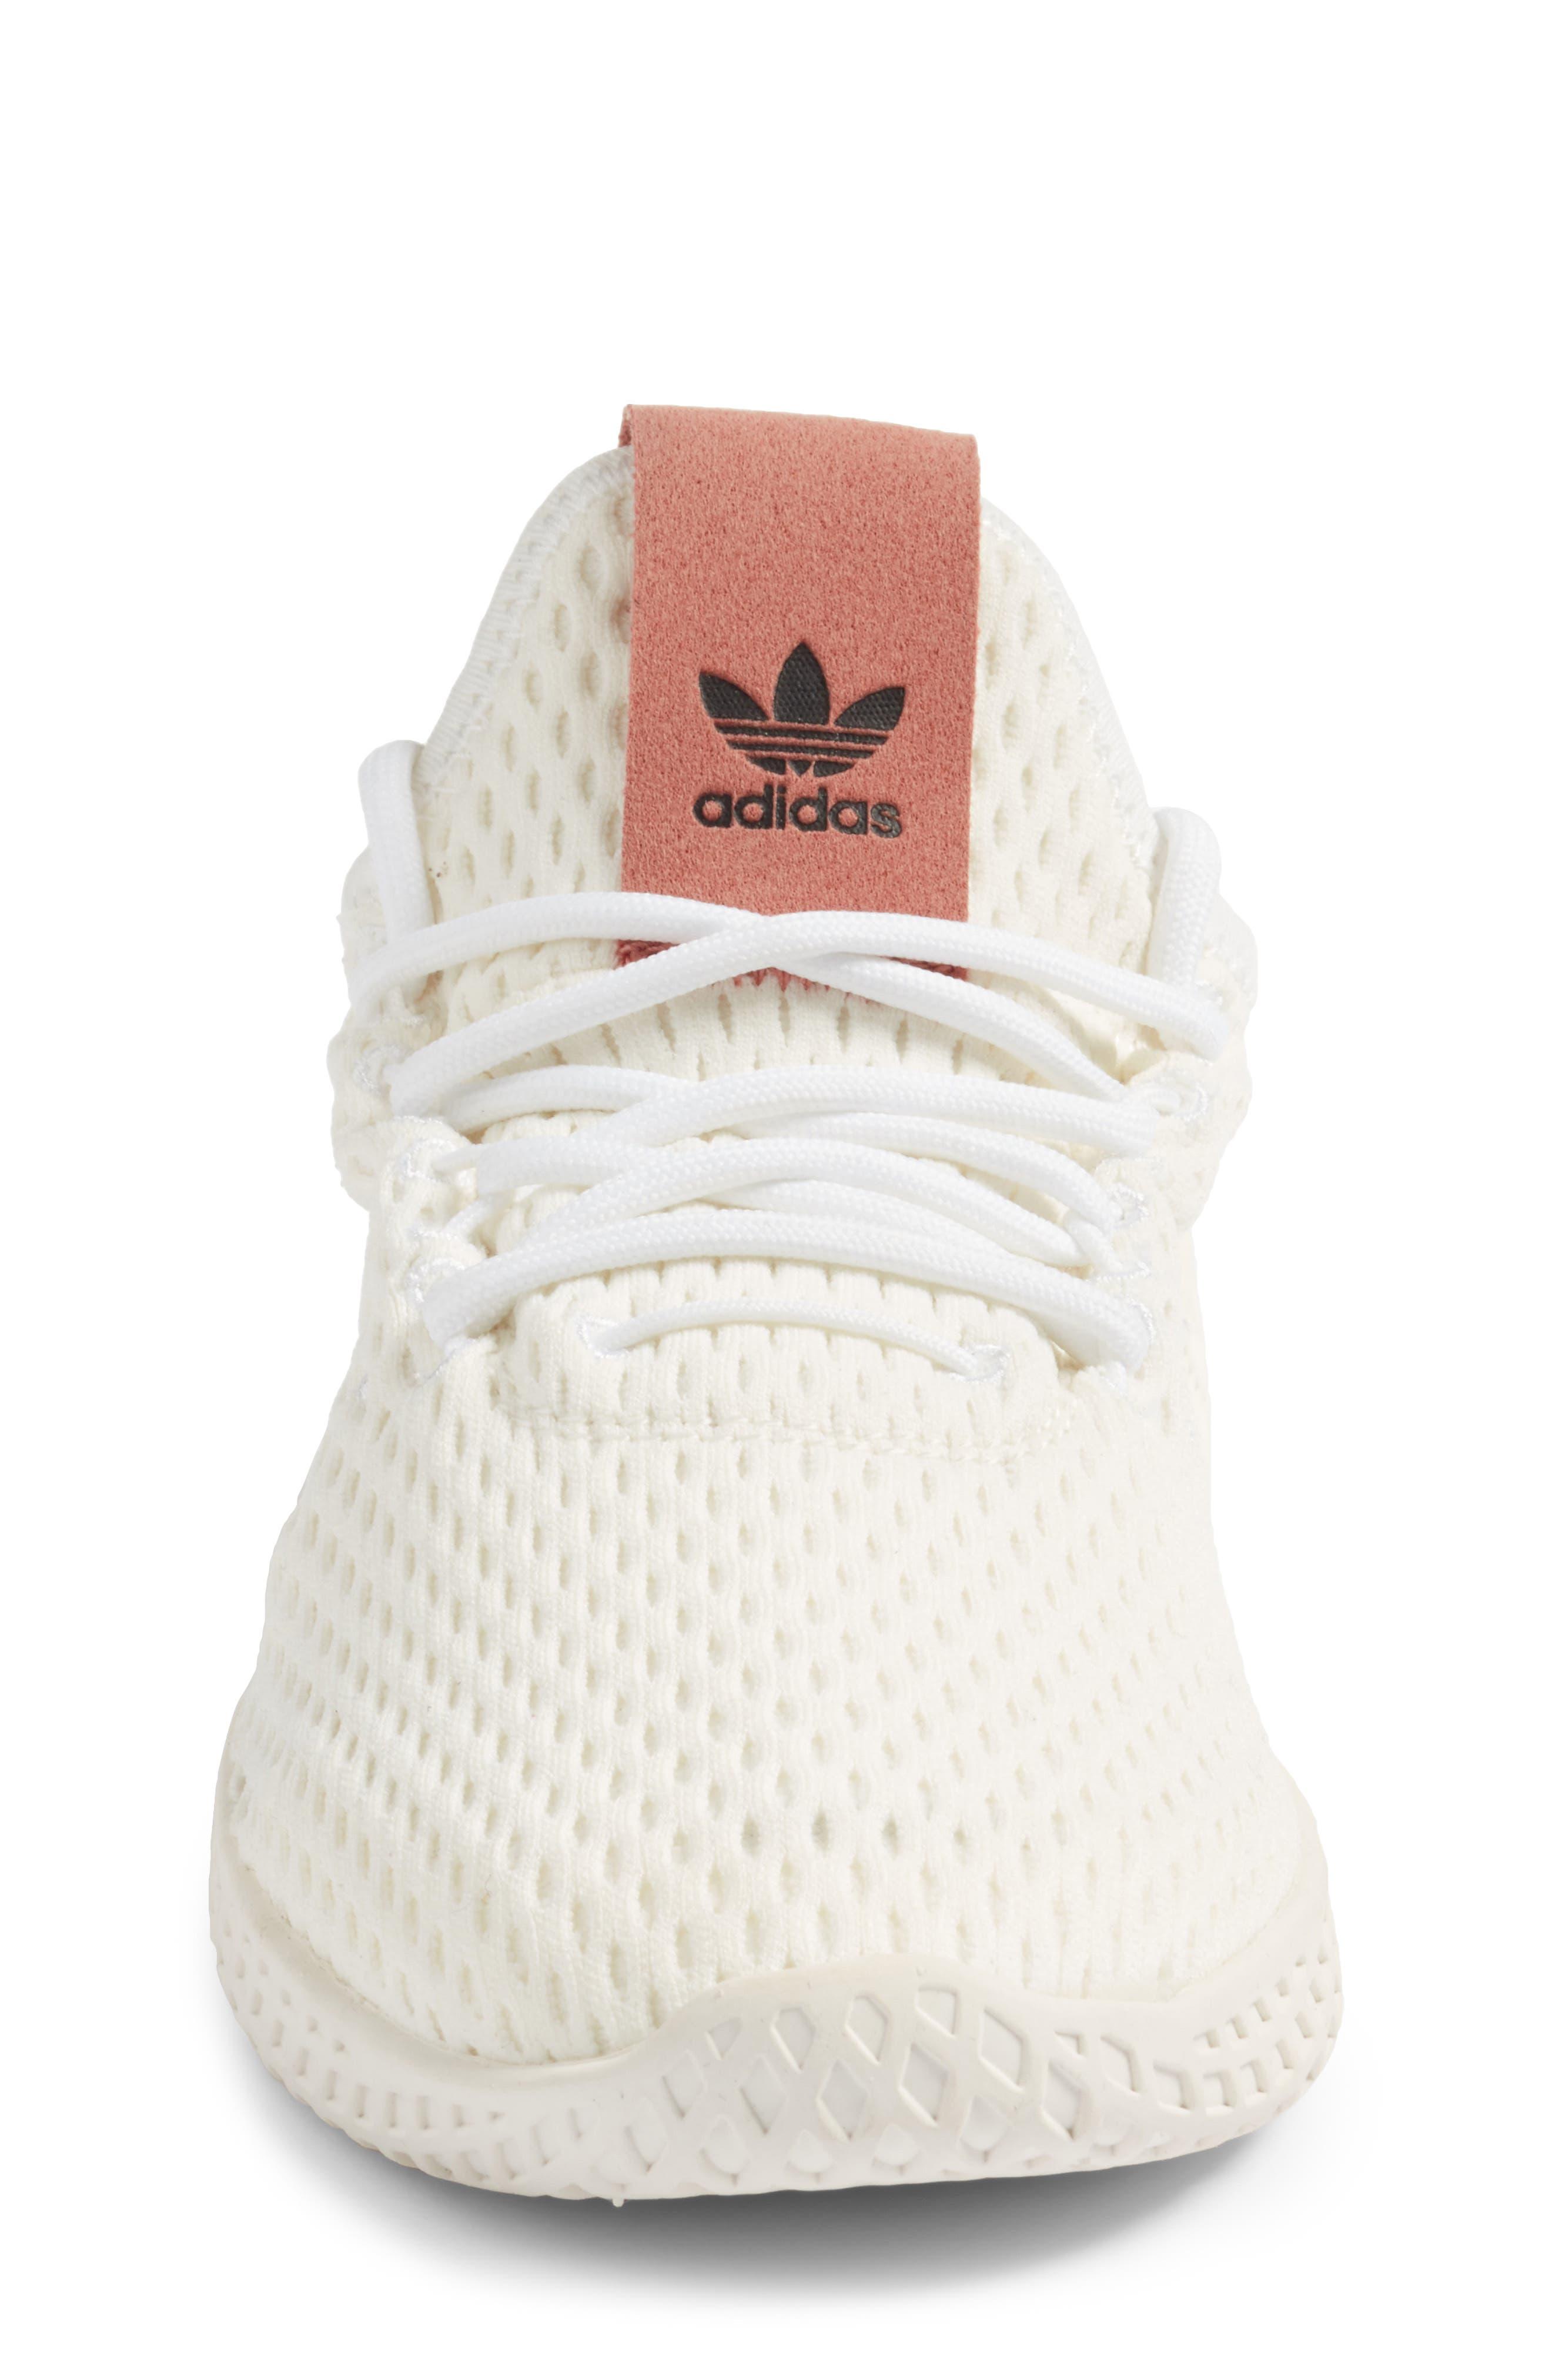 Originals x Pharrell Williams The Summers Mesh Sneaker,                             Alternate thumbnail 4, color,                             100